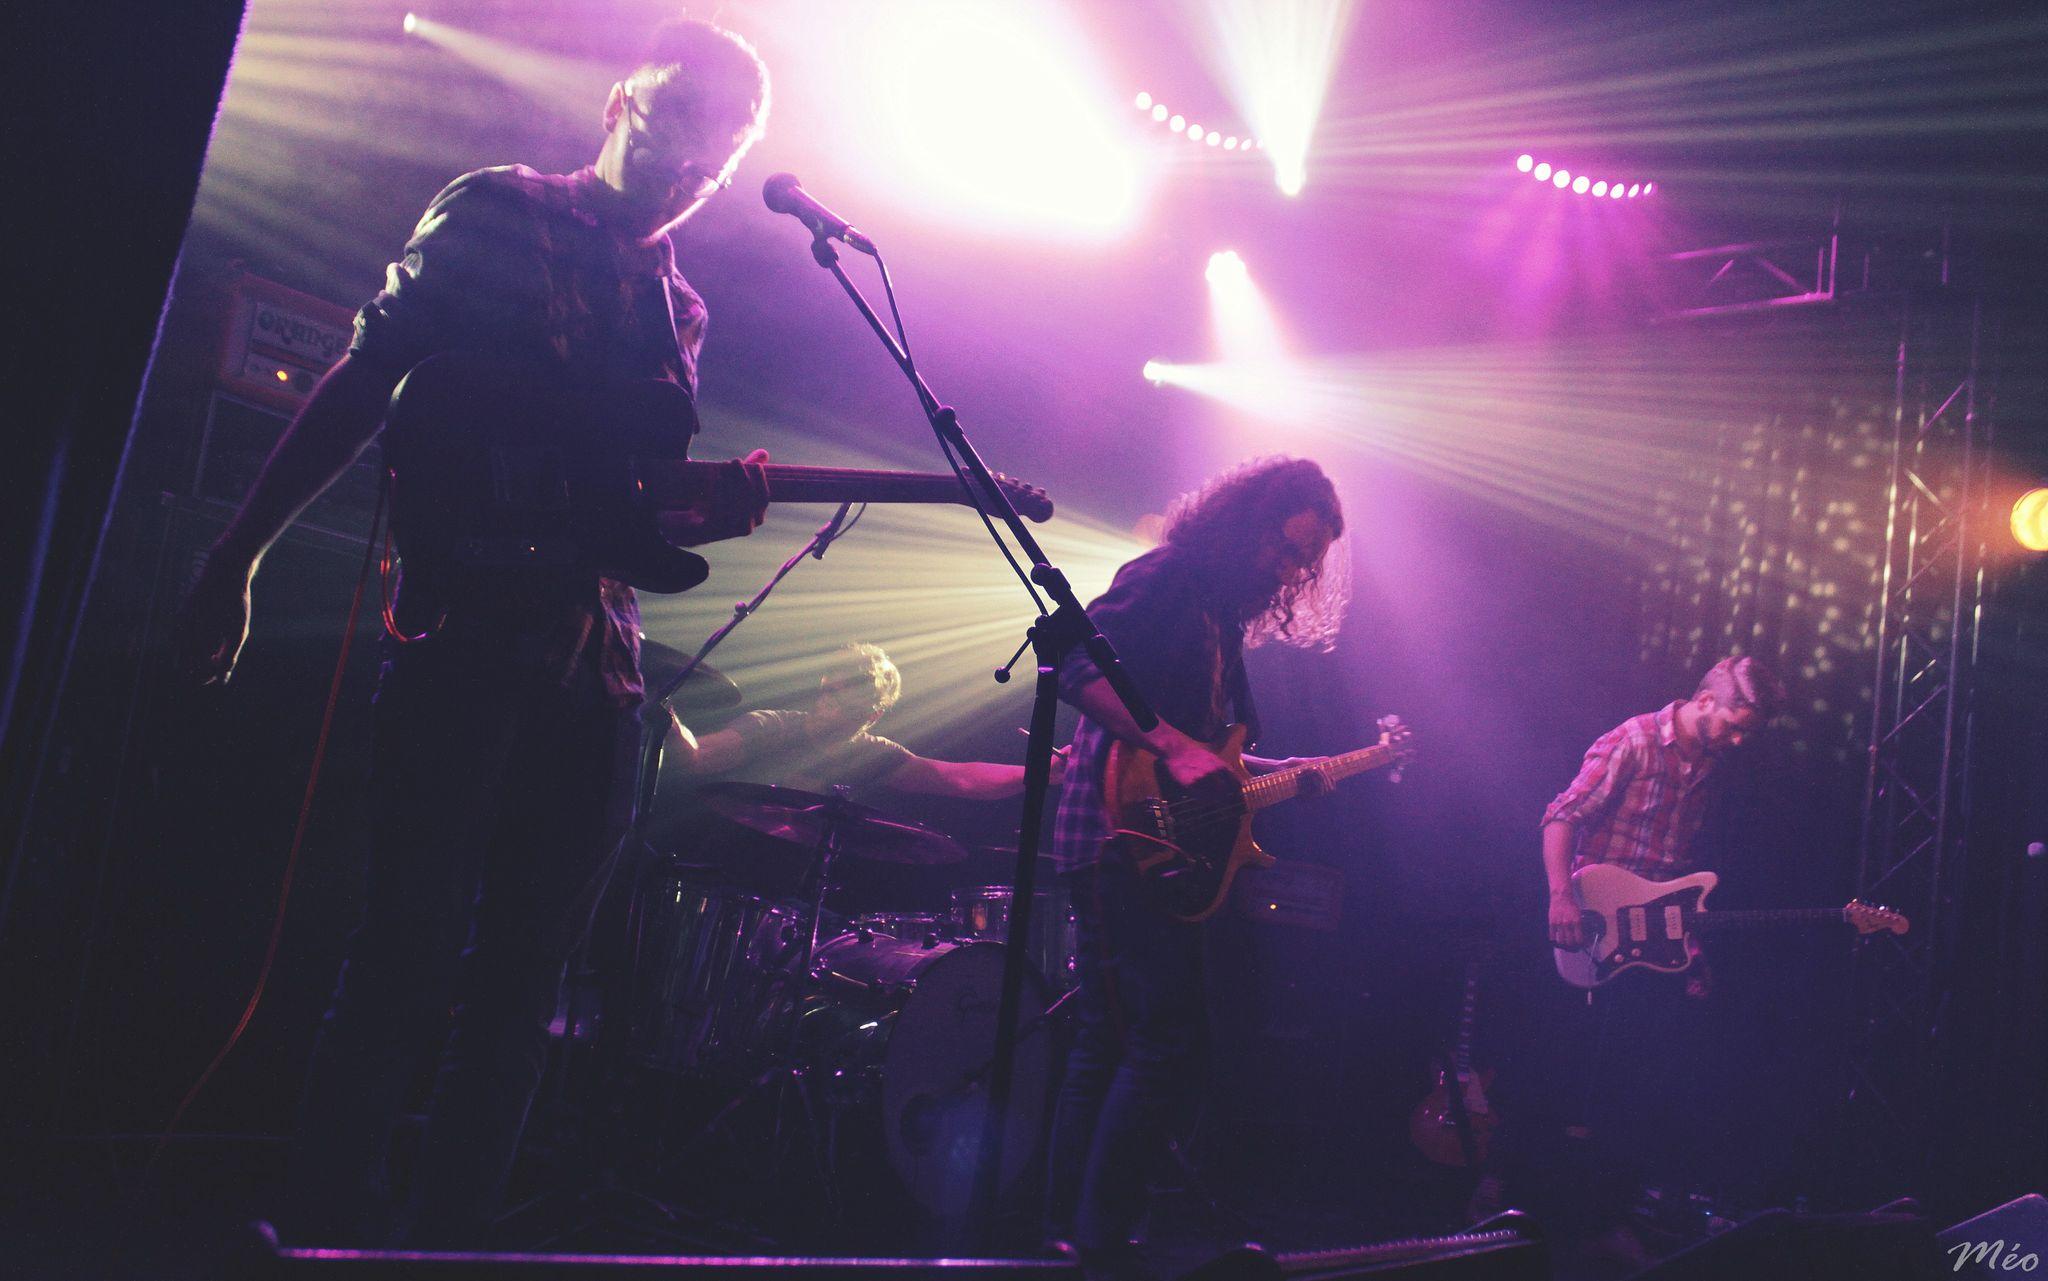 Stoned Harpies